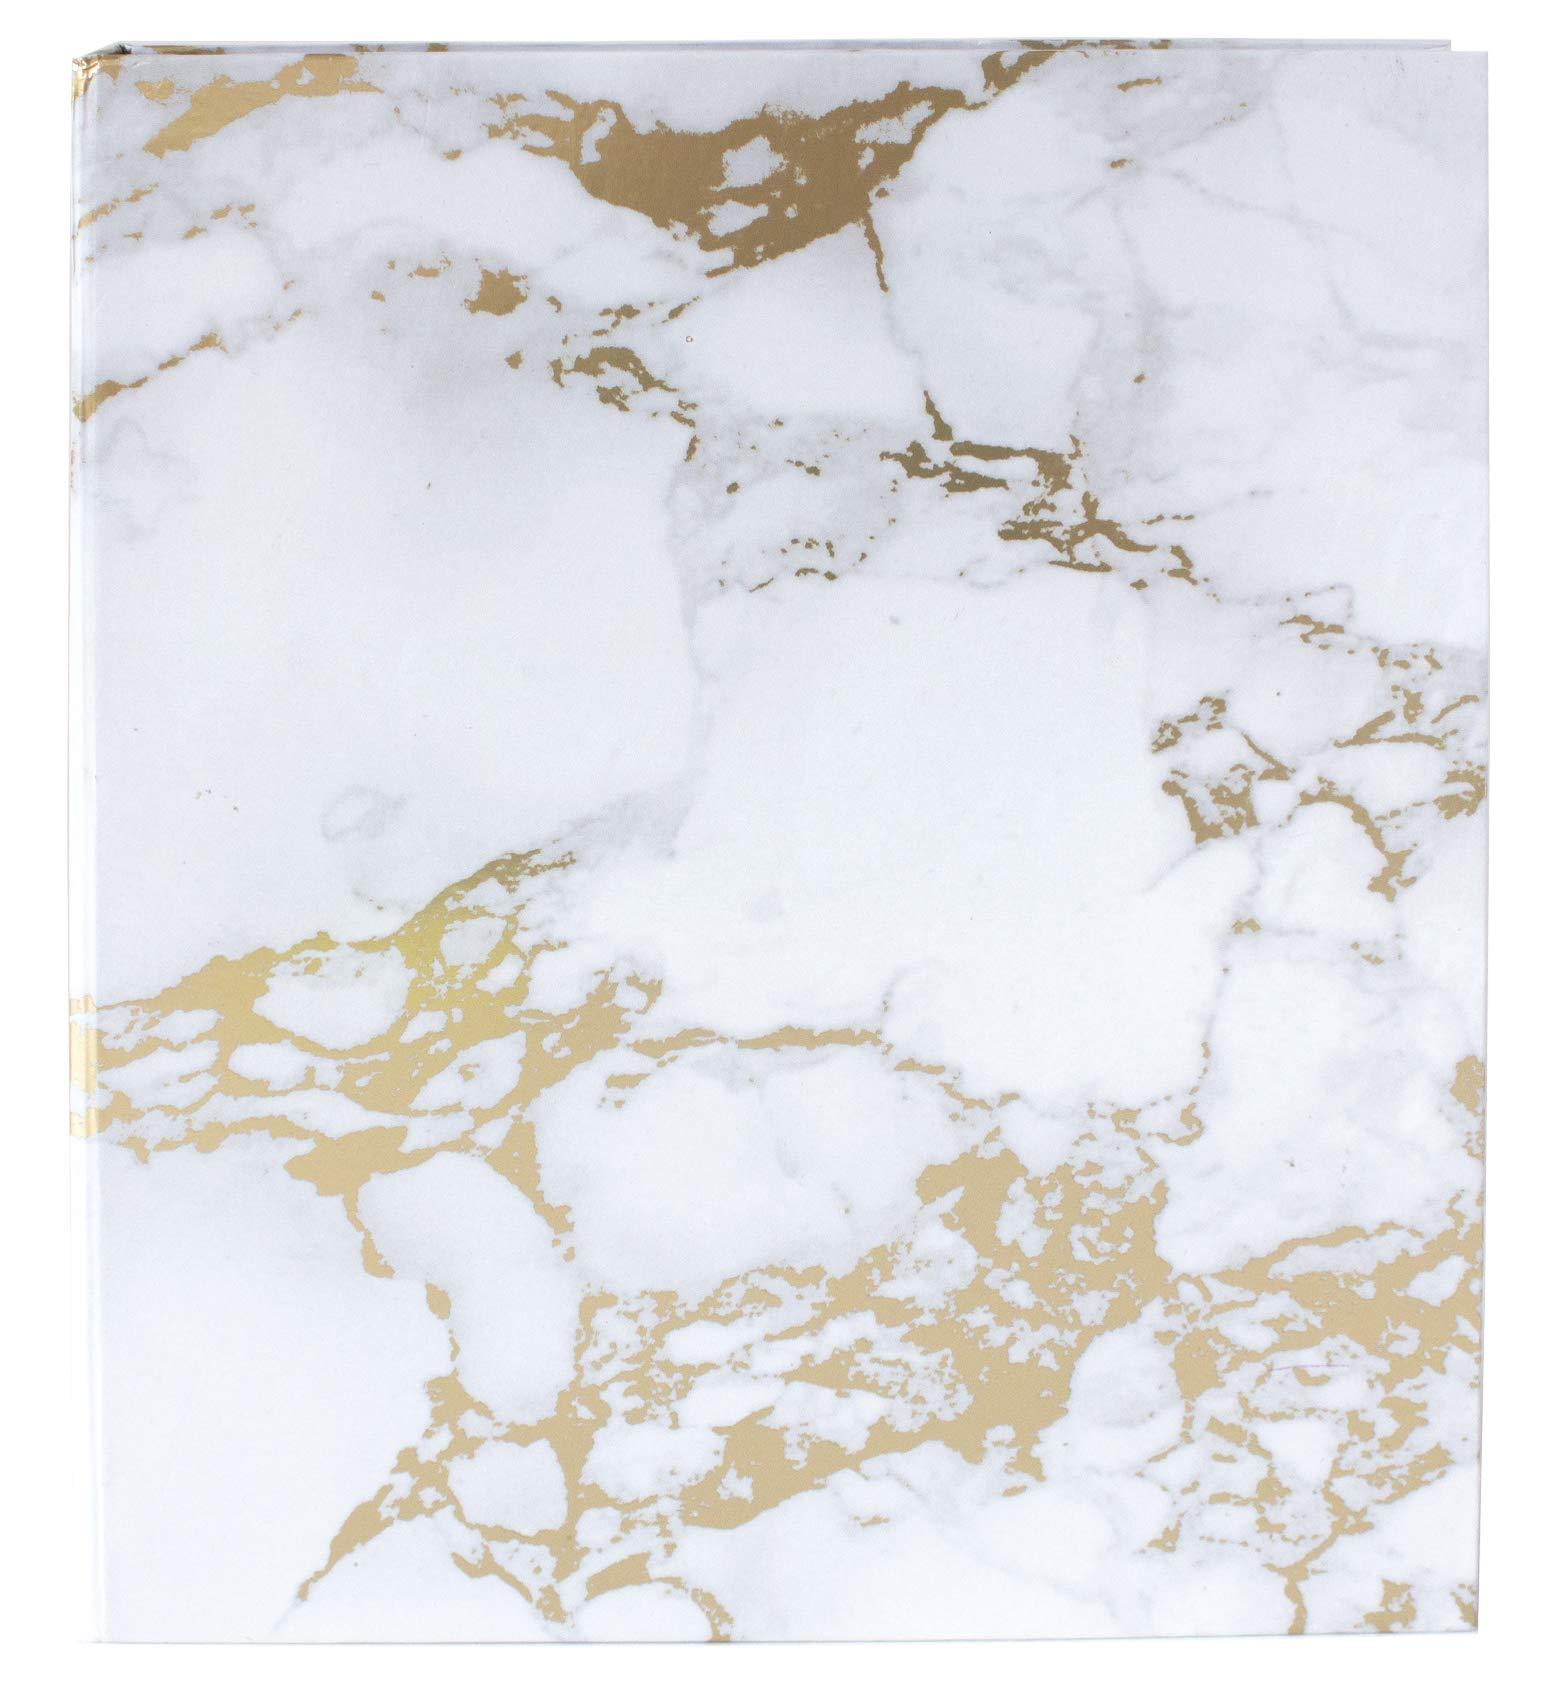 bloom daily planners Binder (+) 3 Ring Binder (+) 1 Inch Ring (+) 10'' x 11.5'' - Gold Marble by bloom daily planners